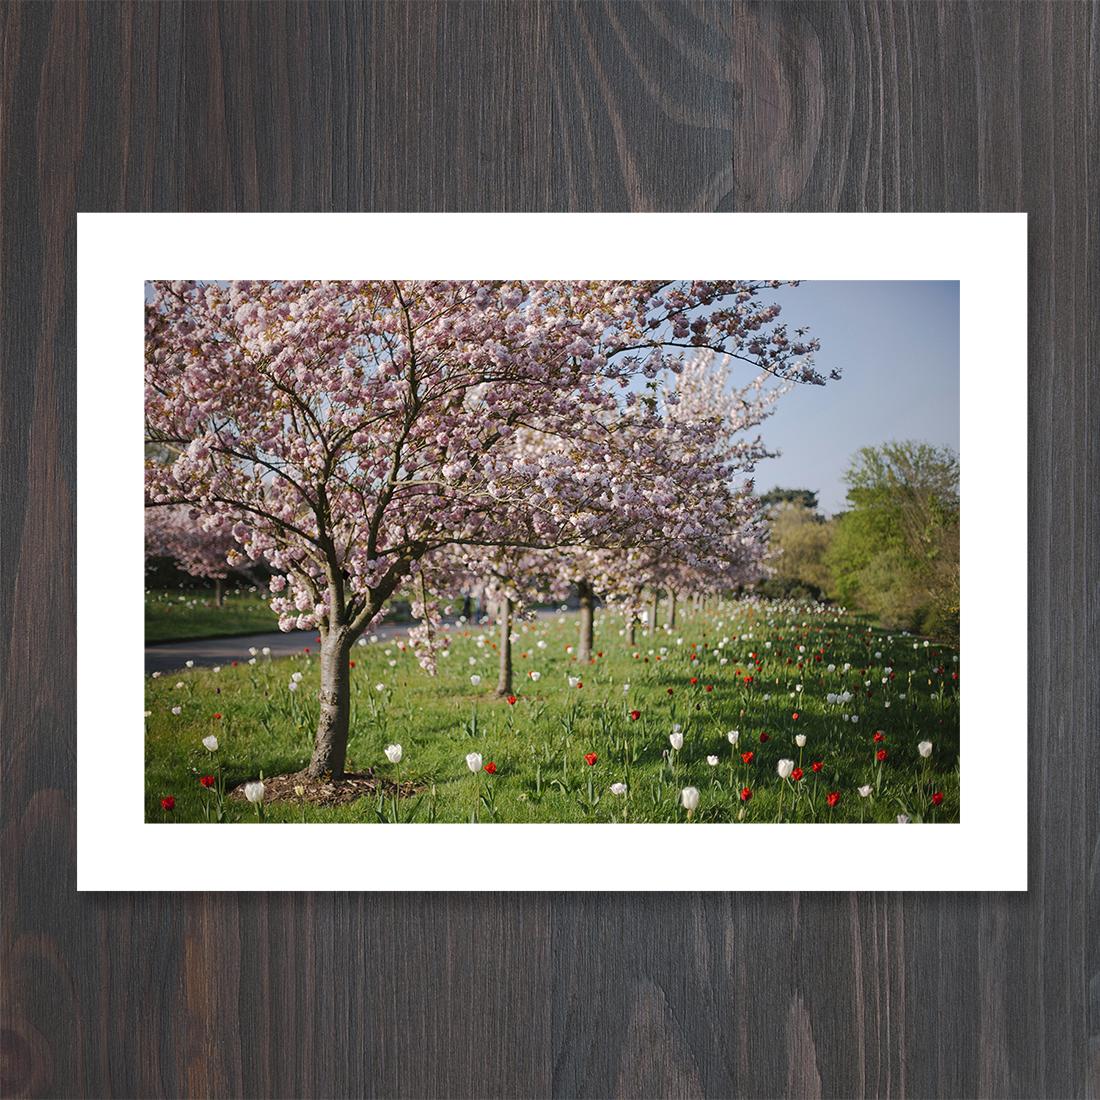 karolina-koziel-photography-products-prints.jpg